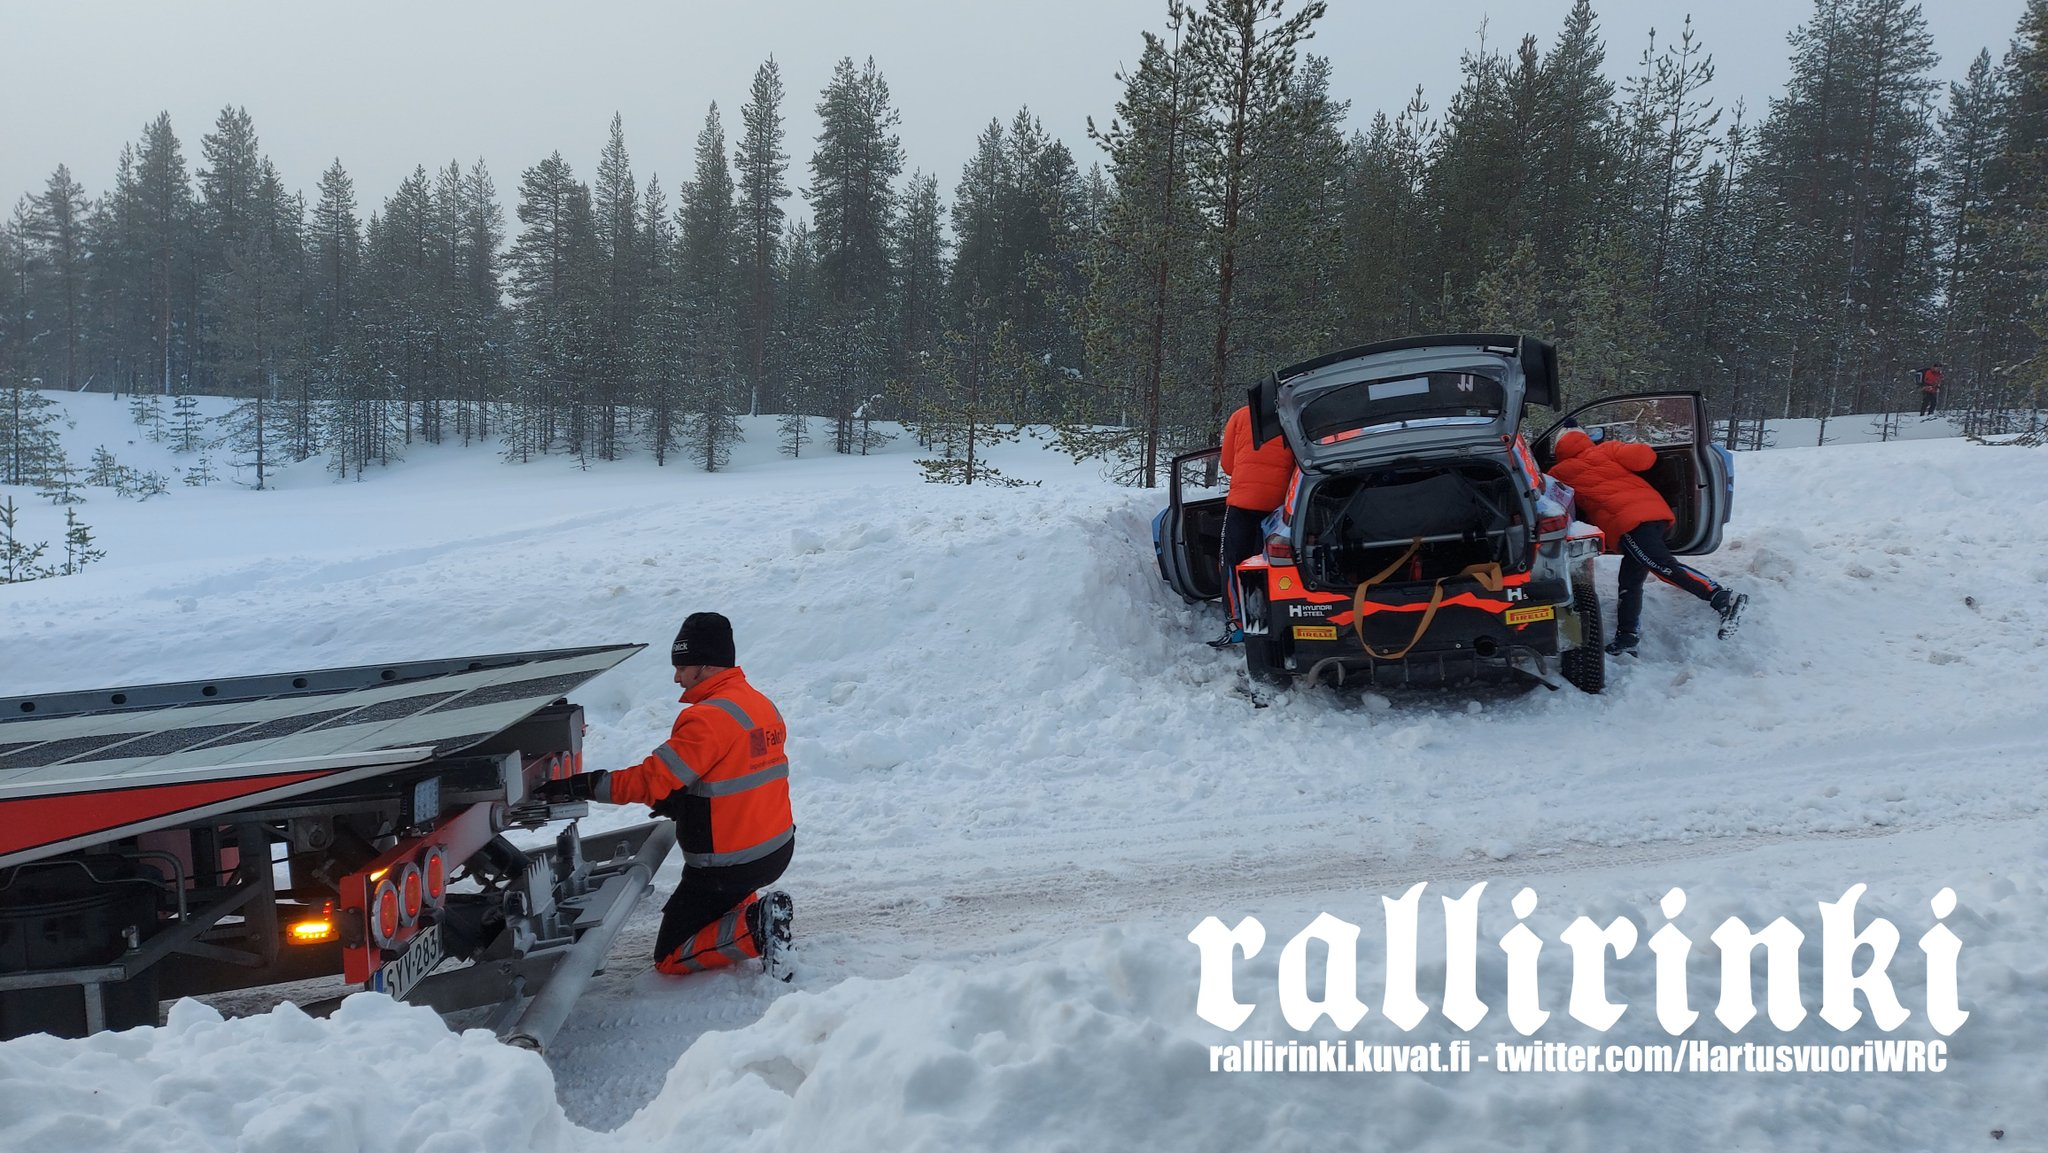 WRC: Arctic Rally Finland - Powered by CapitalBox [26-28 Febrero] - Página 2 EvItxyjXAAQW9VK?format=jpg&name=large